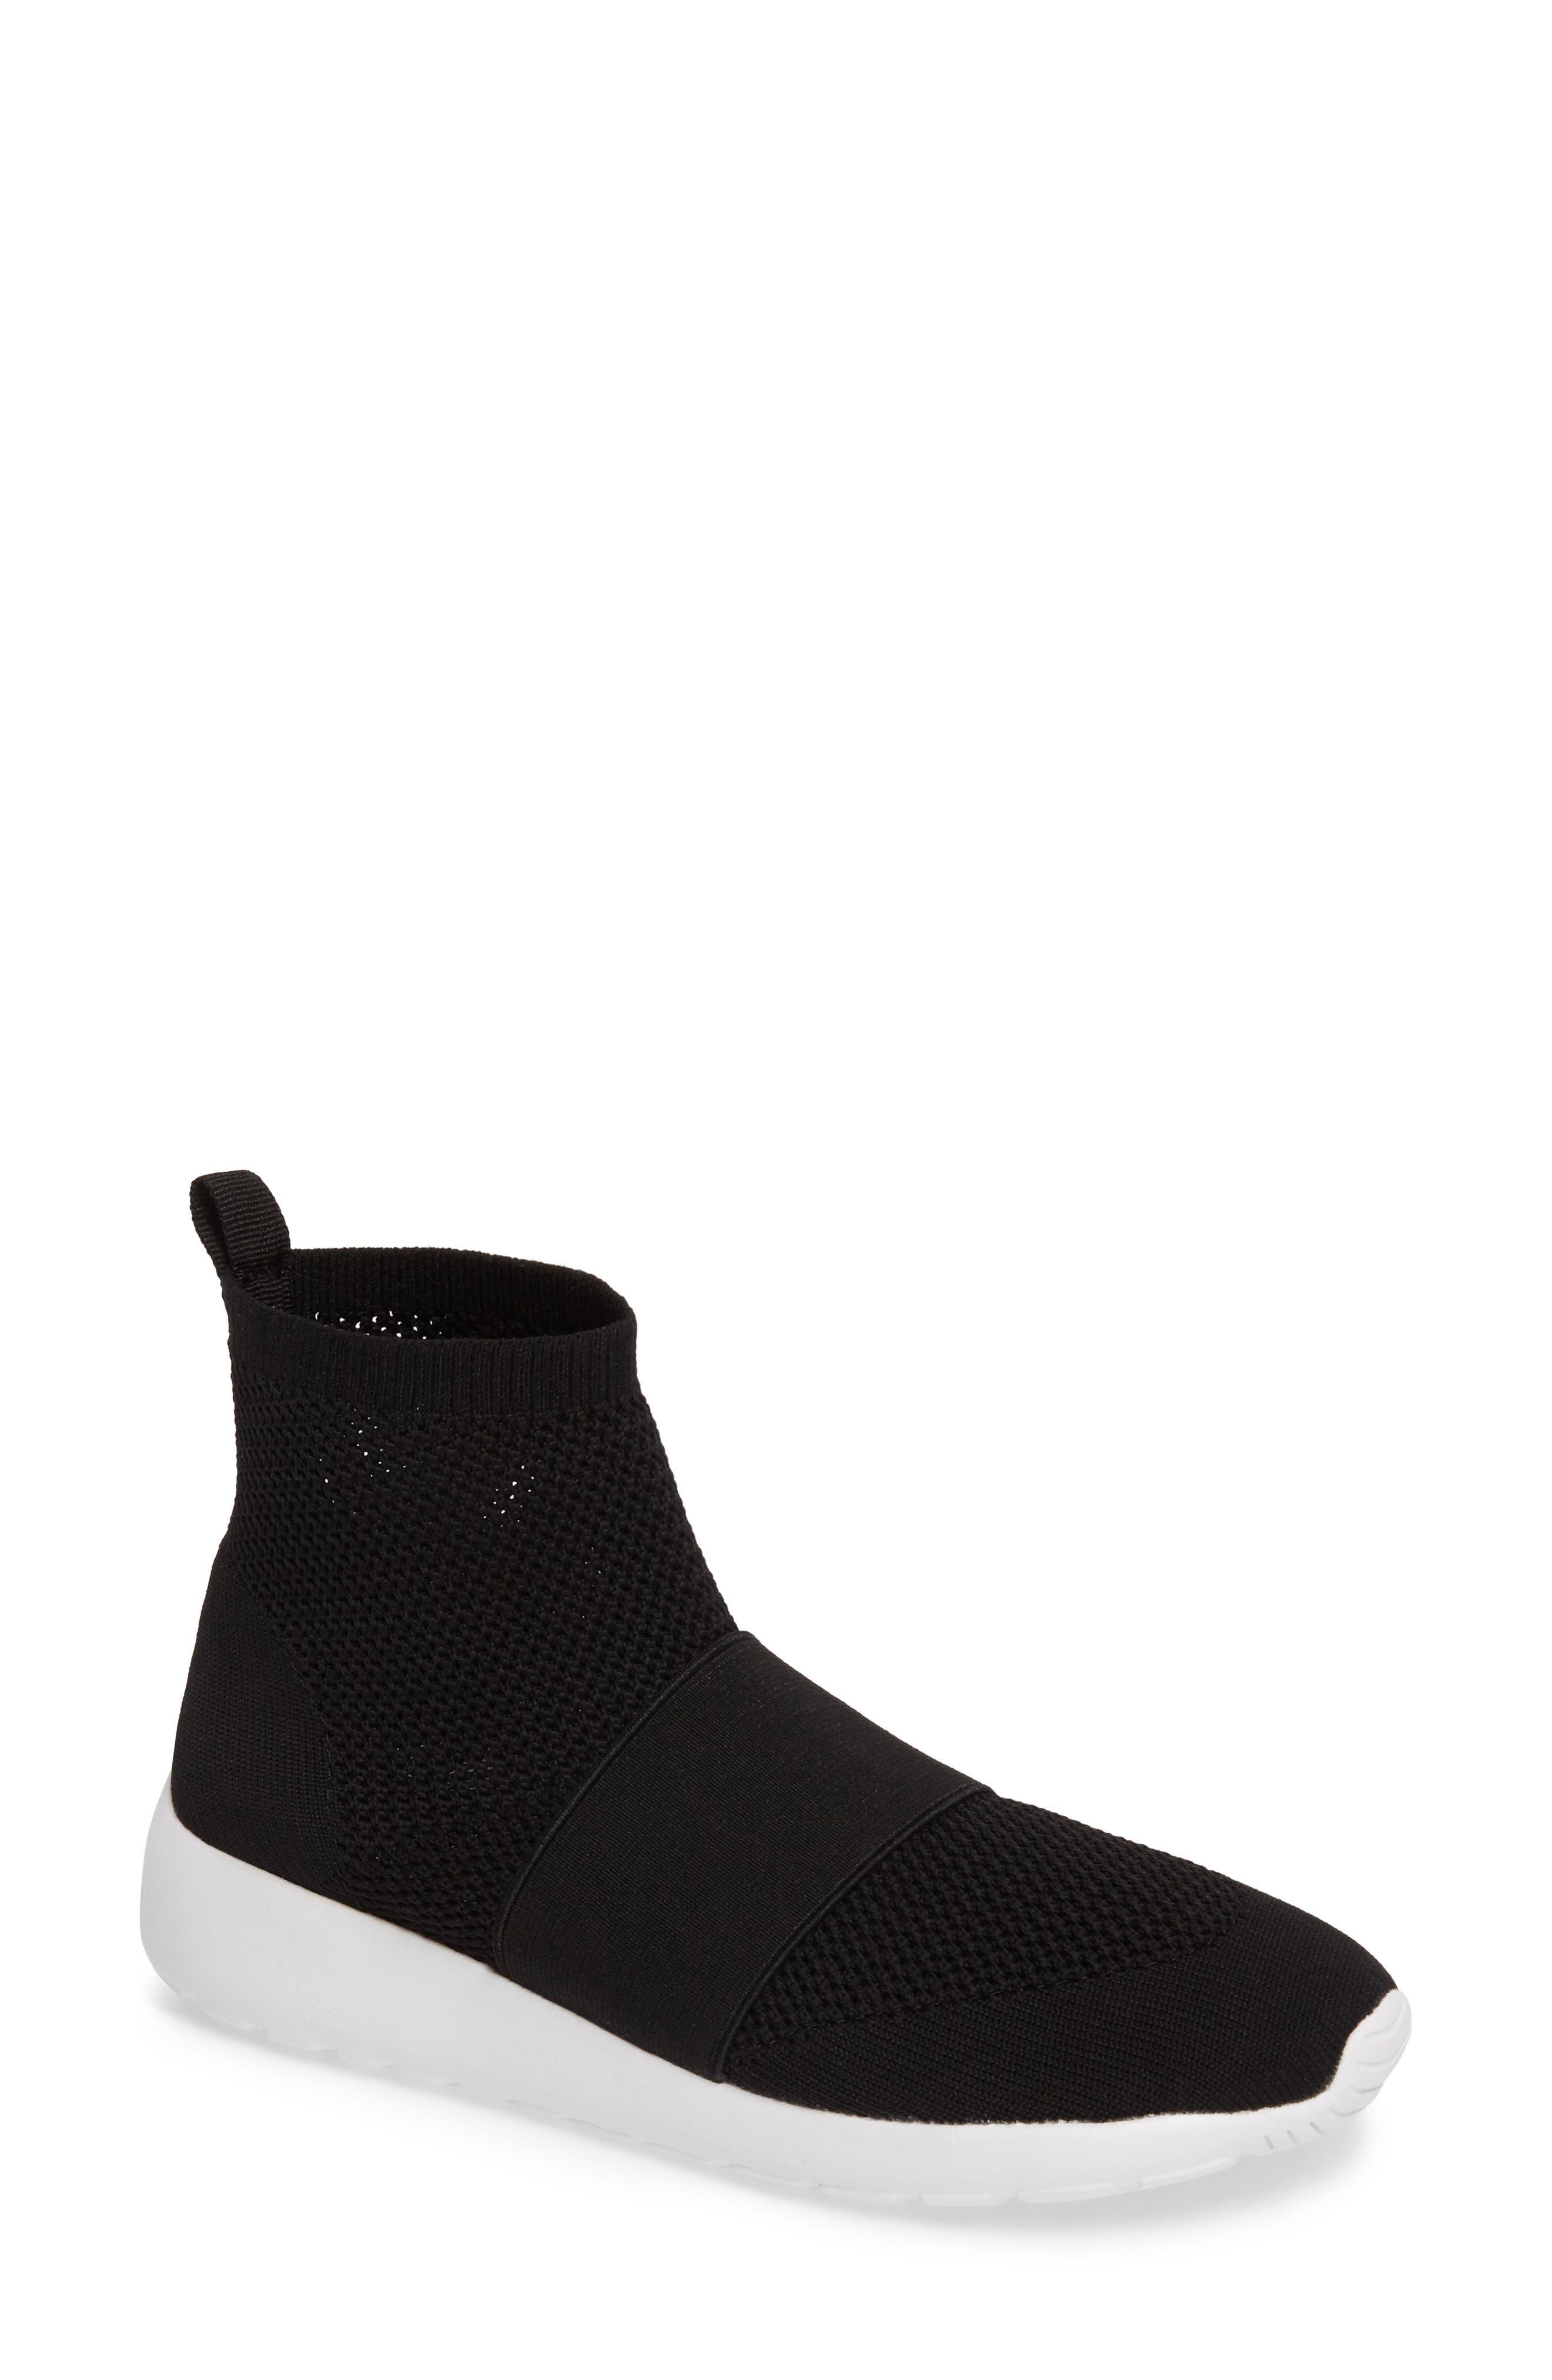 Future Sneaker,                             Main thumbnail 1, color,                             001